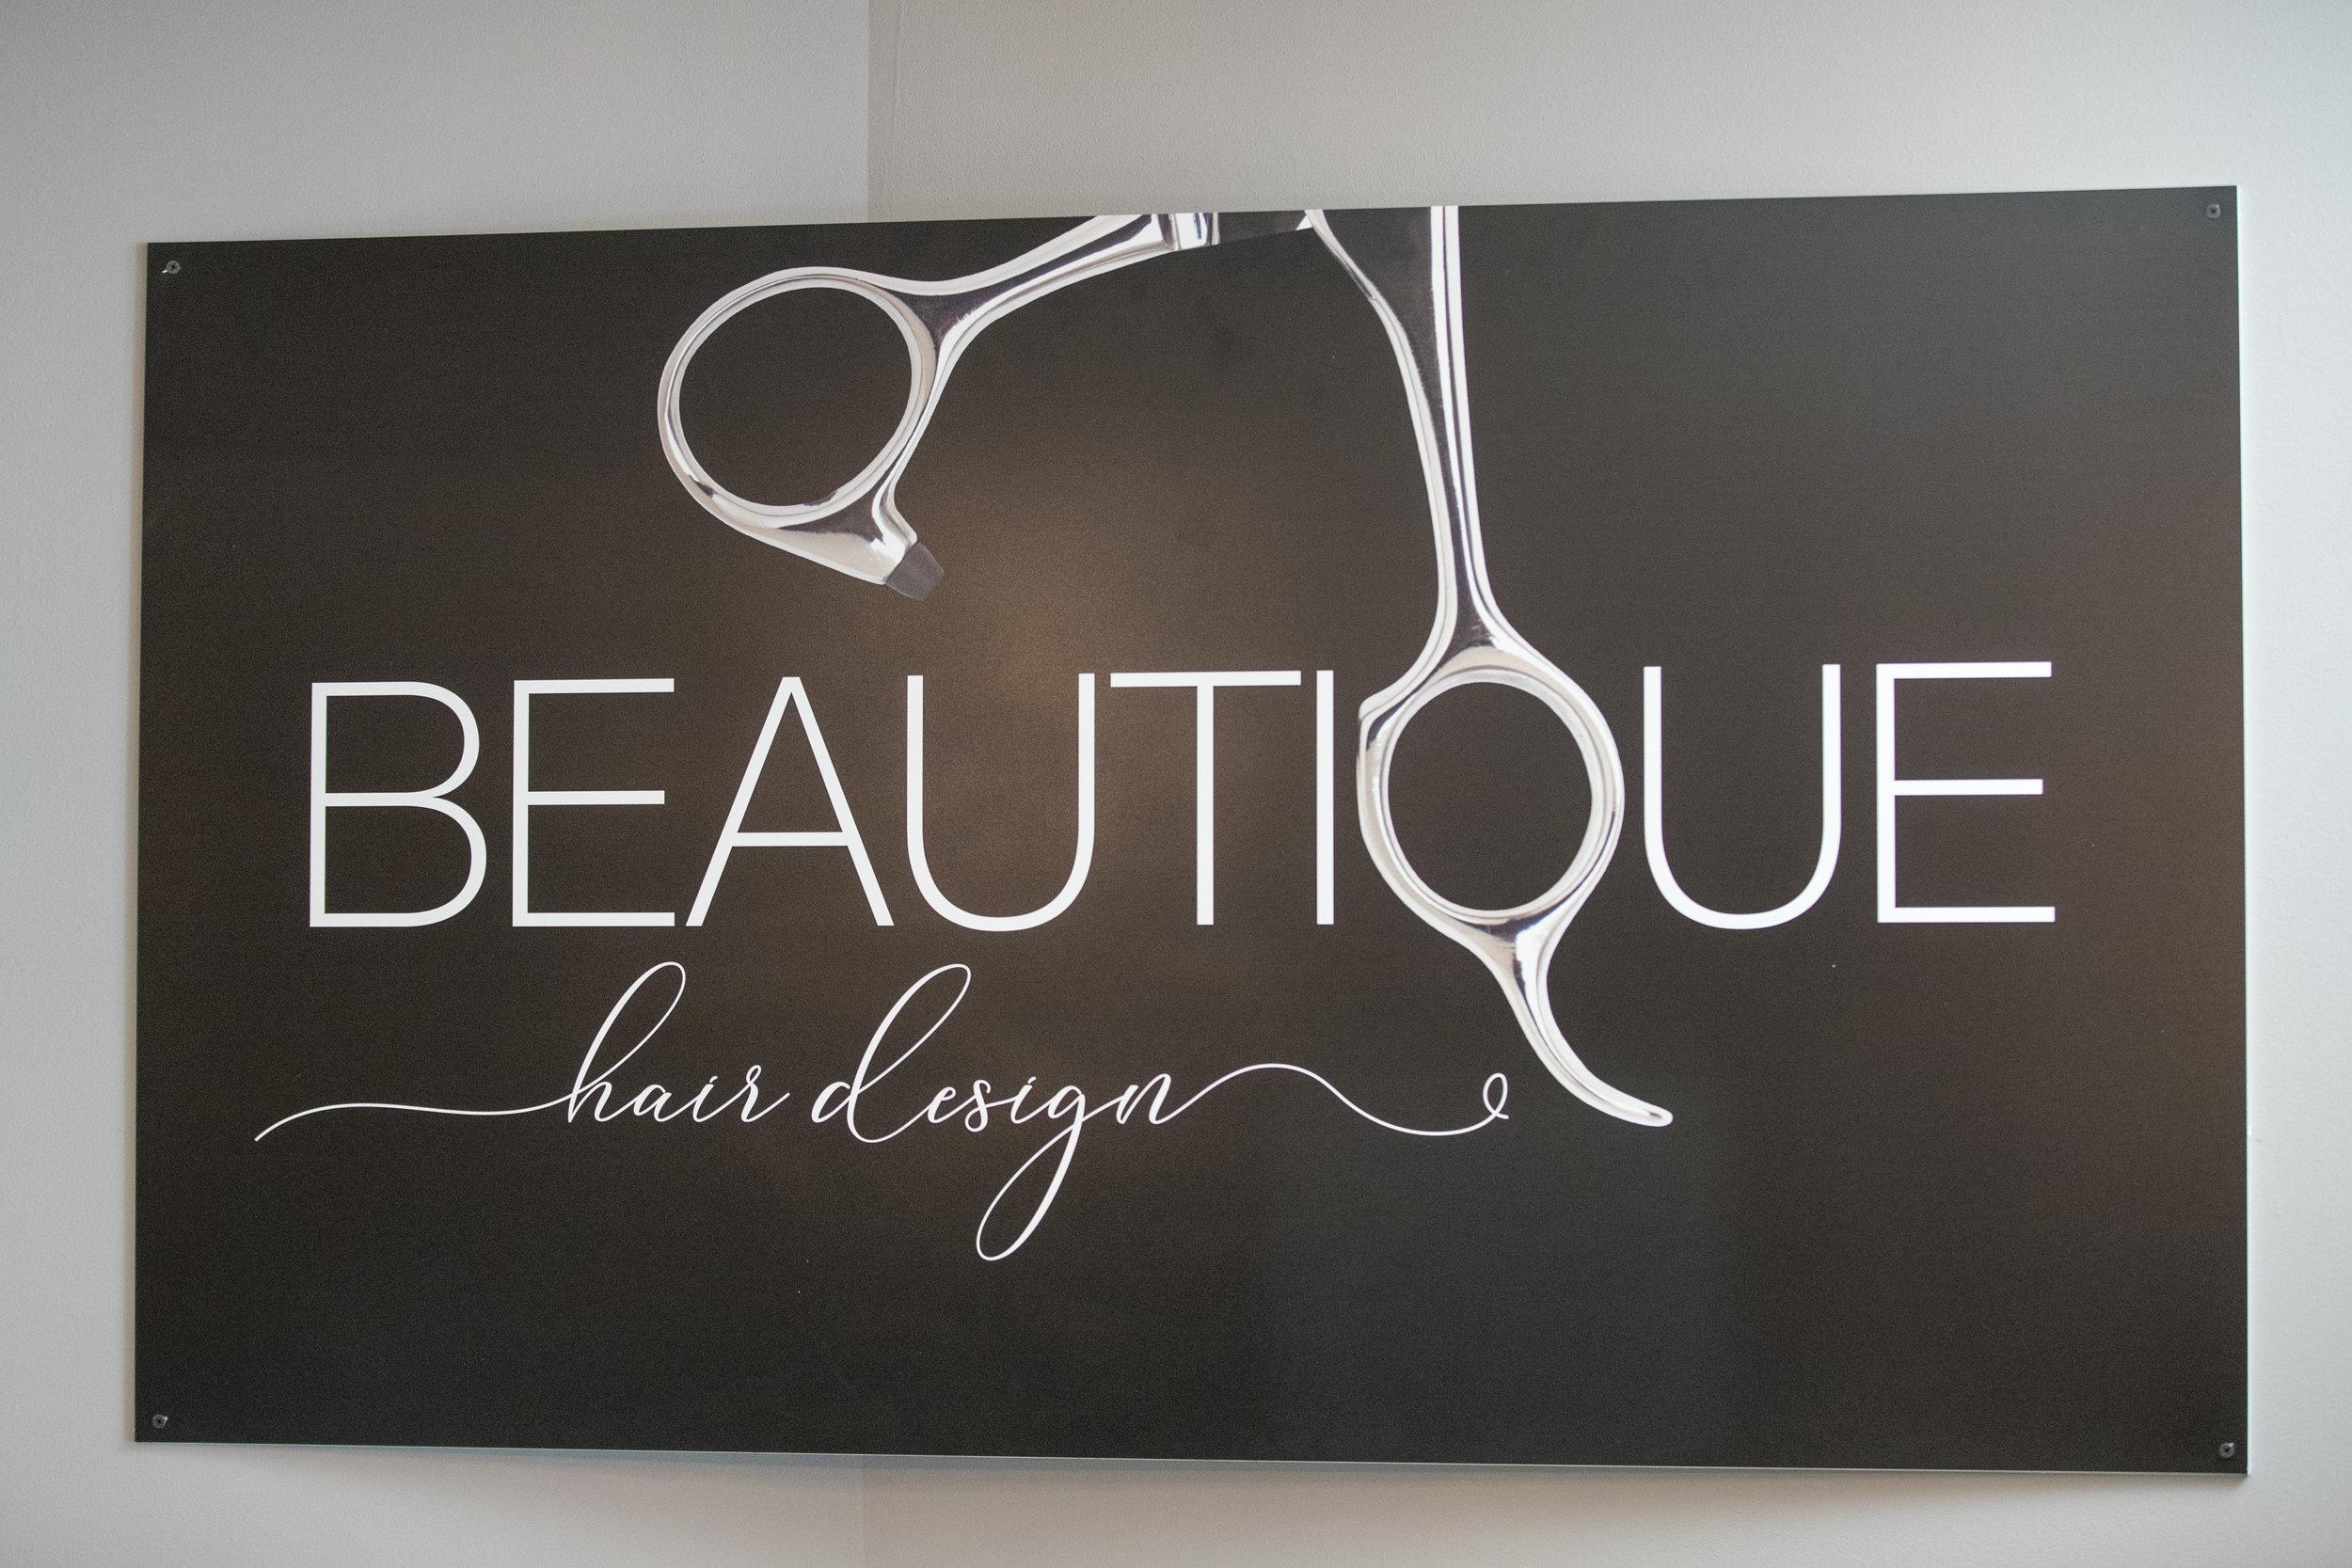 4.8.19-BeautiqueHairSalon-213.jpg